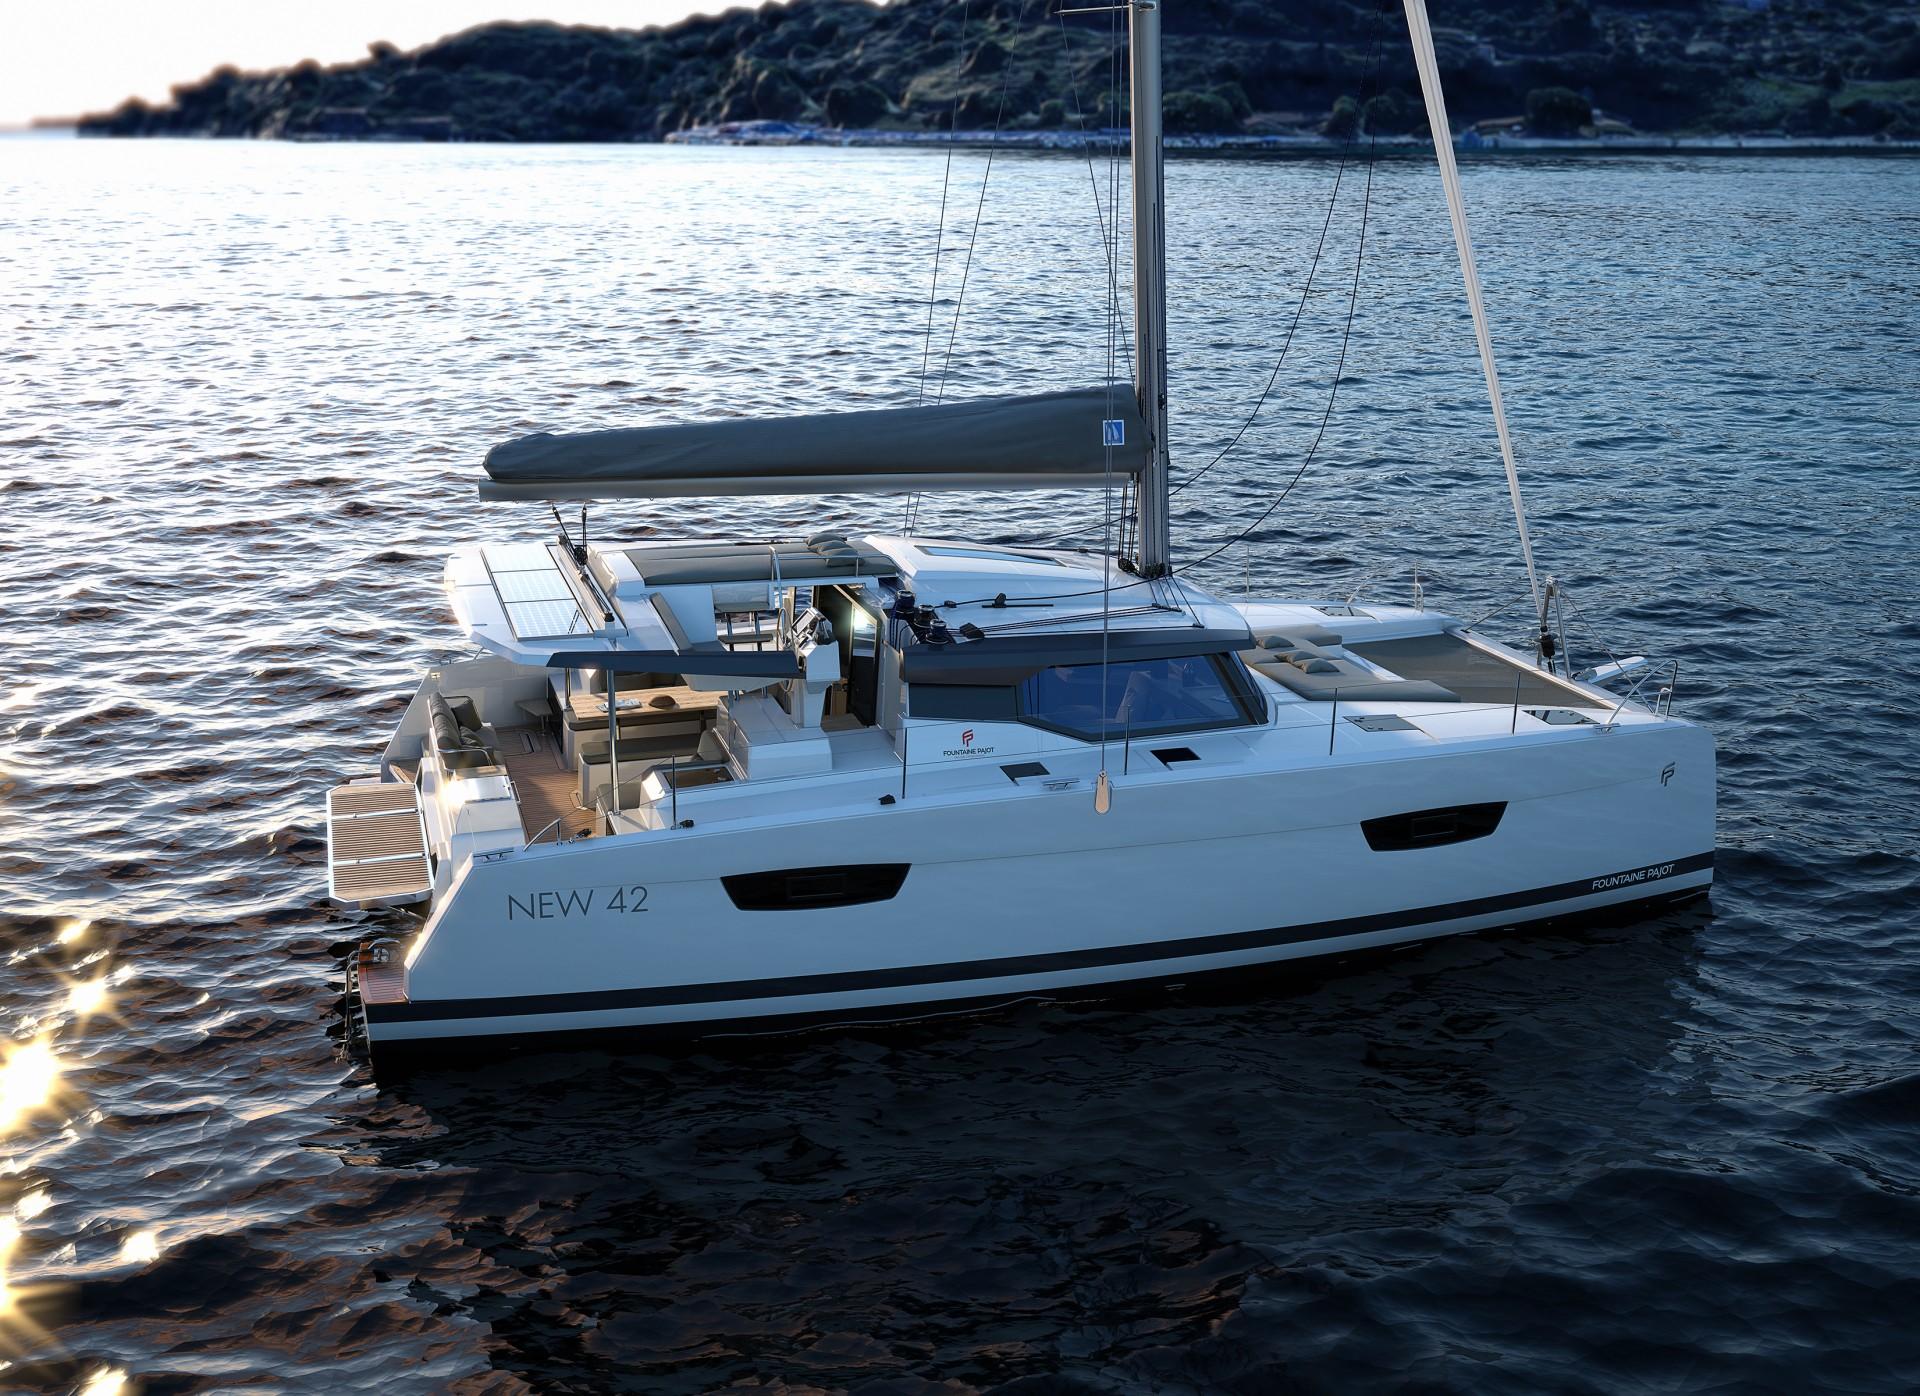 A New Fountaine Pajot Catamaran Sailing Catamaran New 42